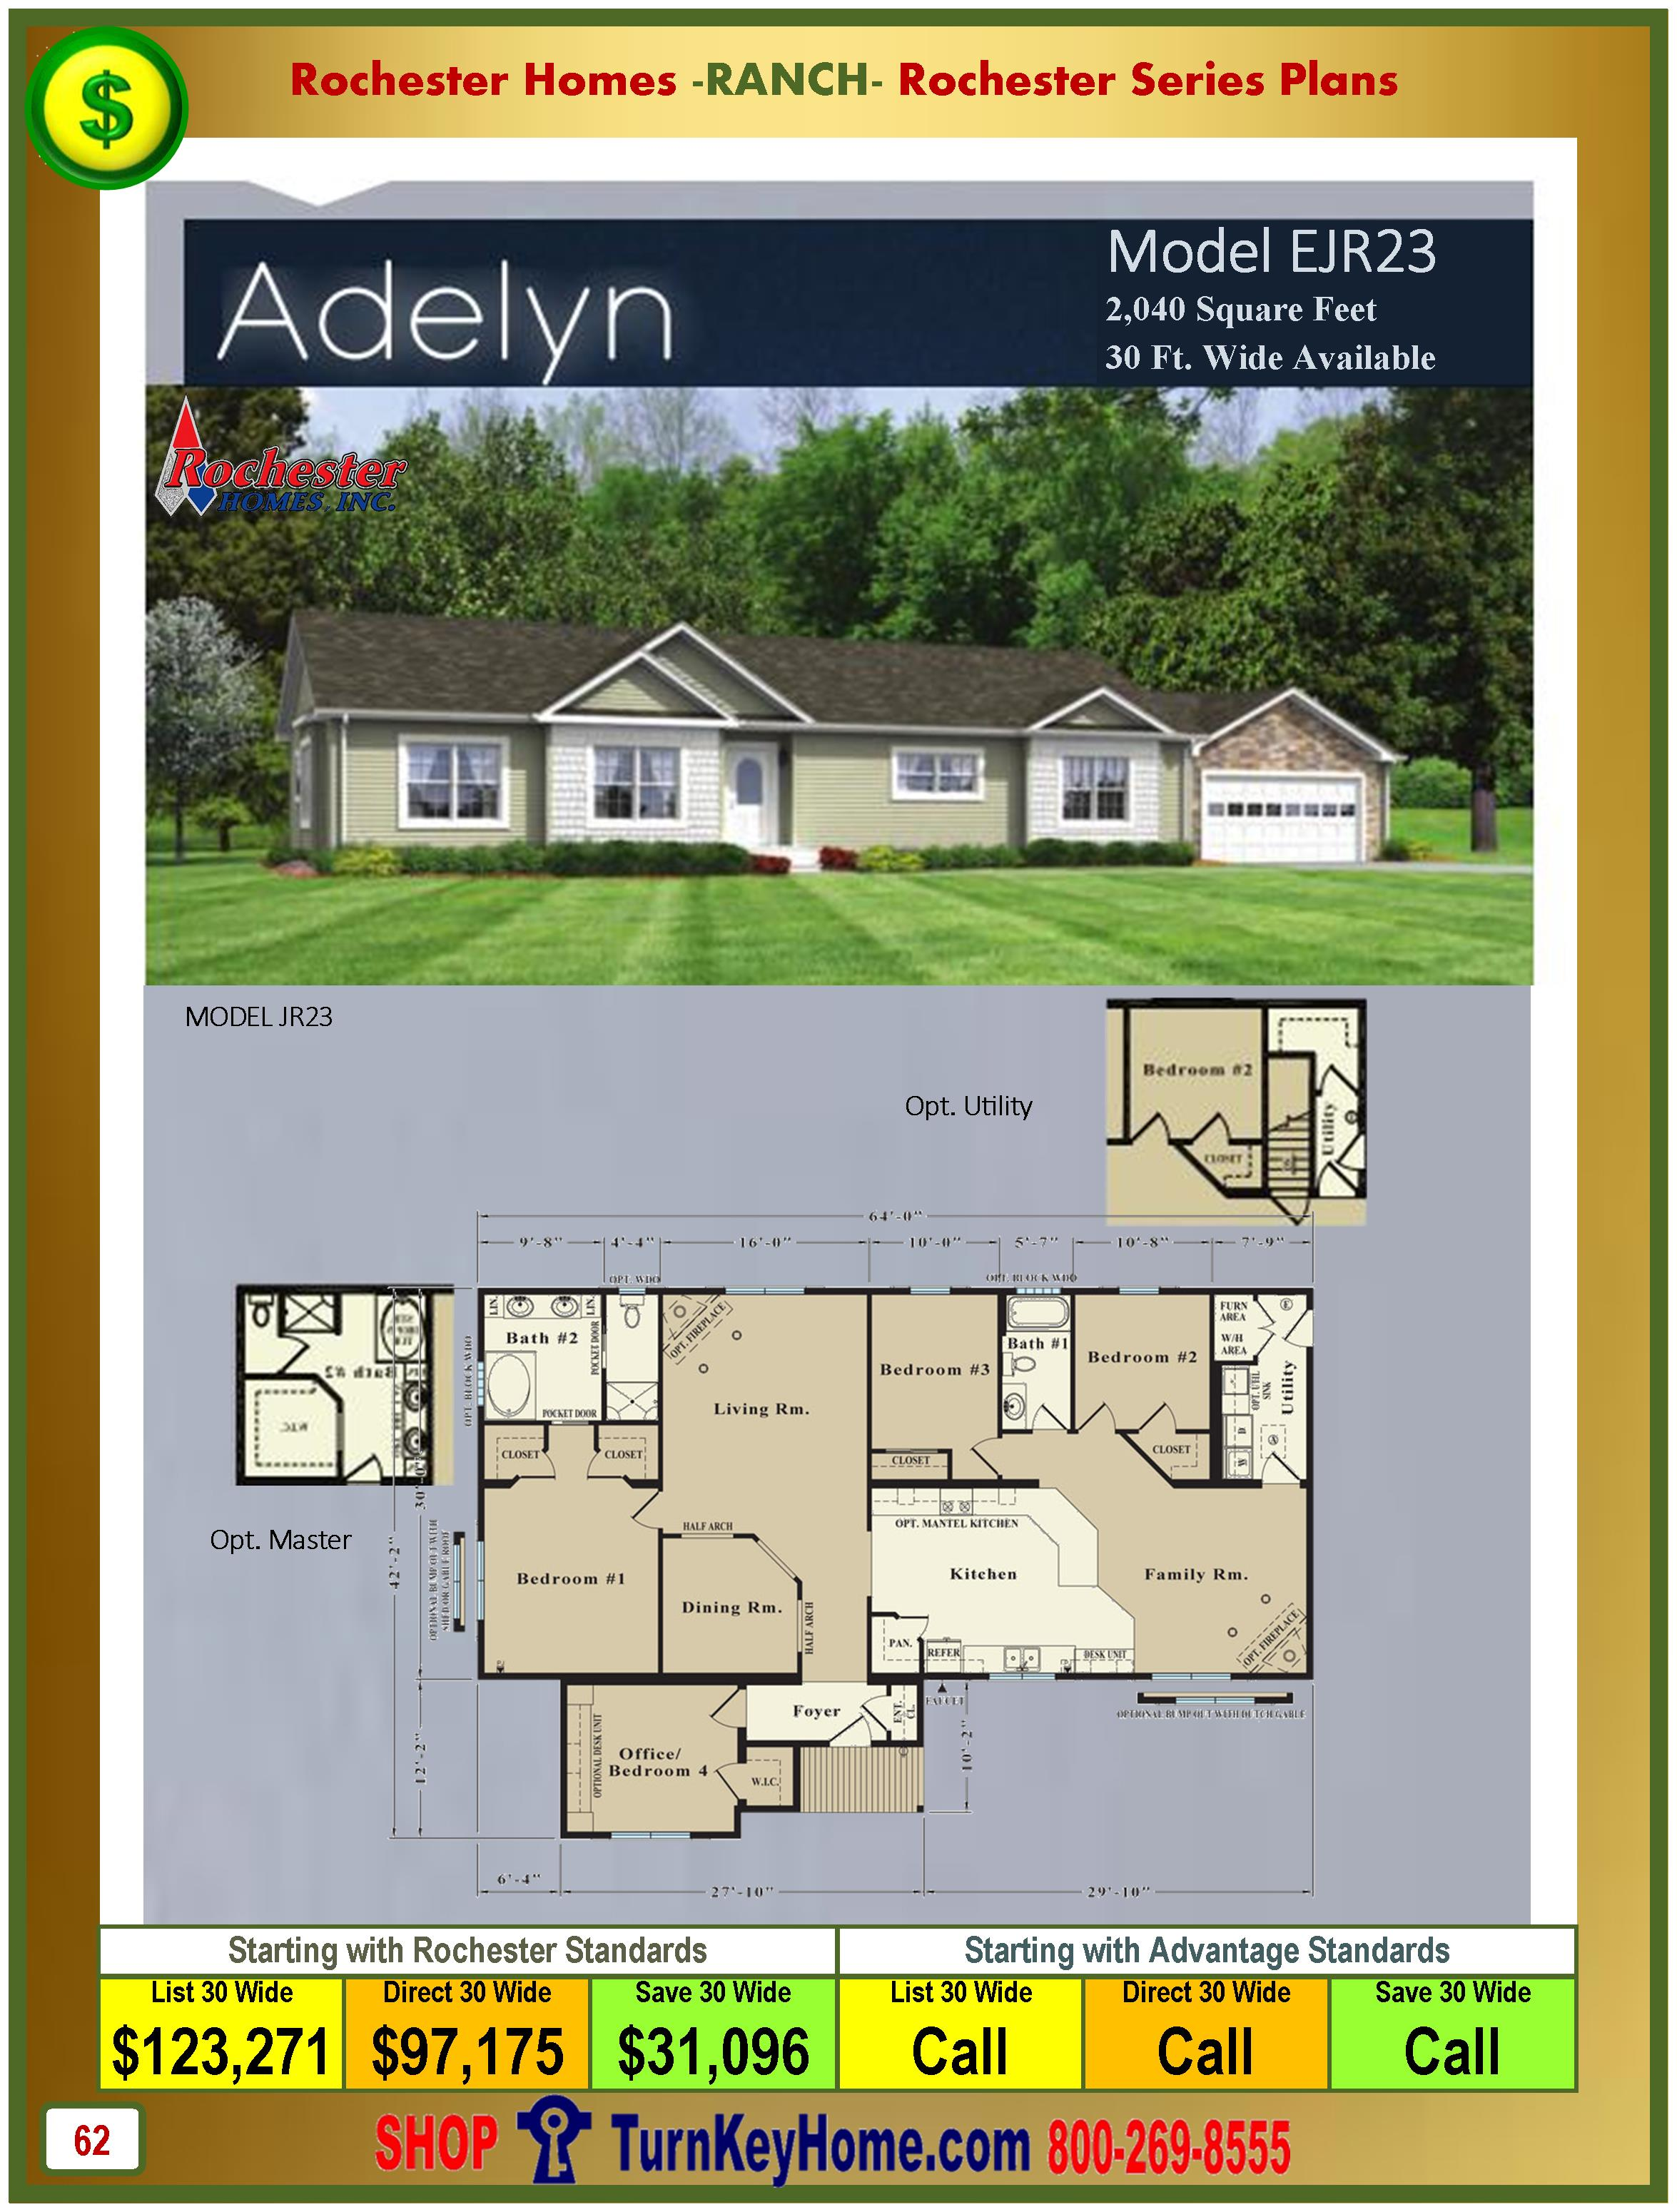 Modular.Homes.Rochester.Home.Inc.Adelyn.EJR23.Ranch.Plan.Price.Catalog.P62.1215